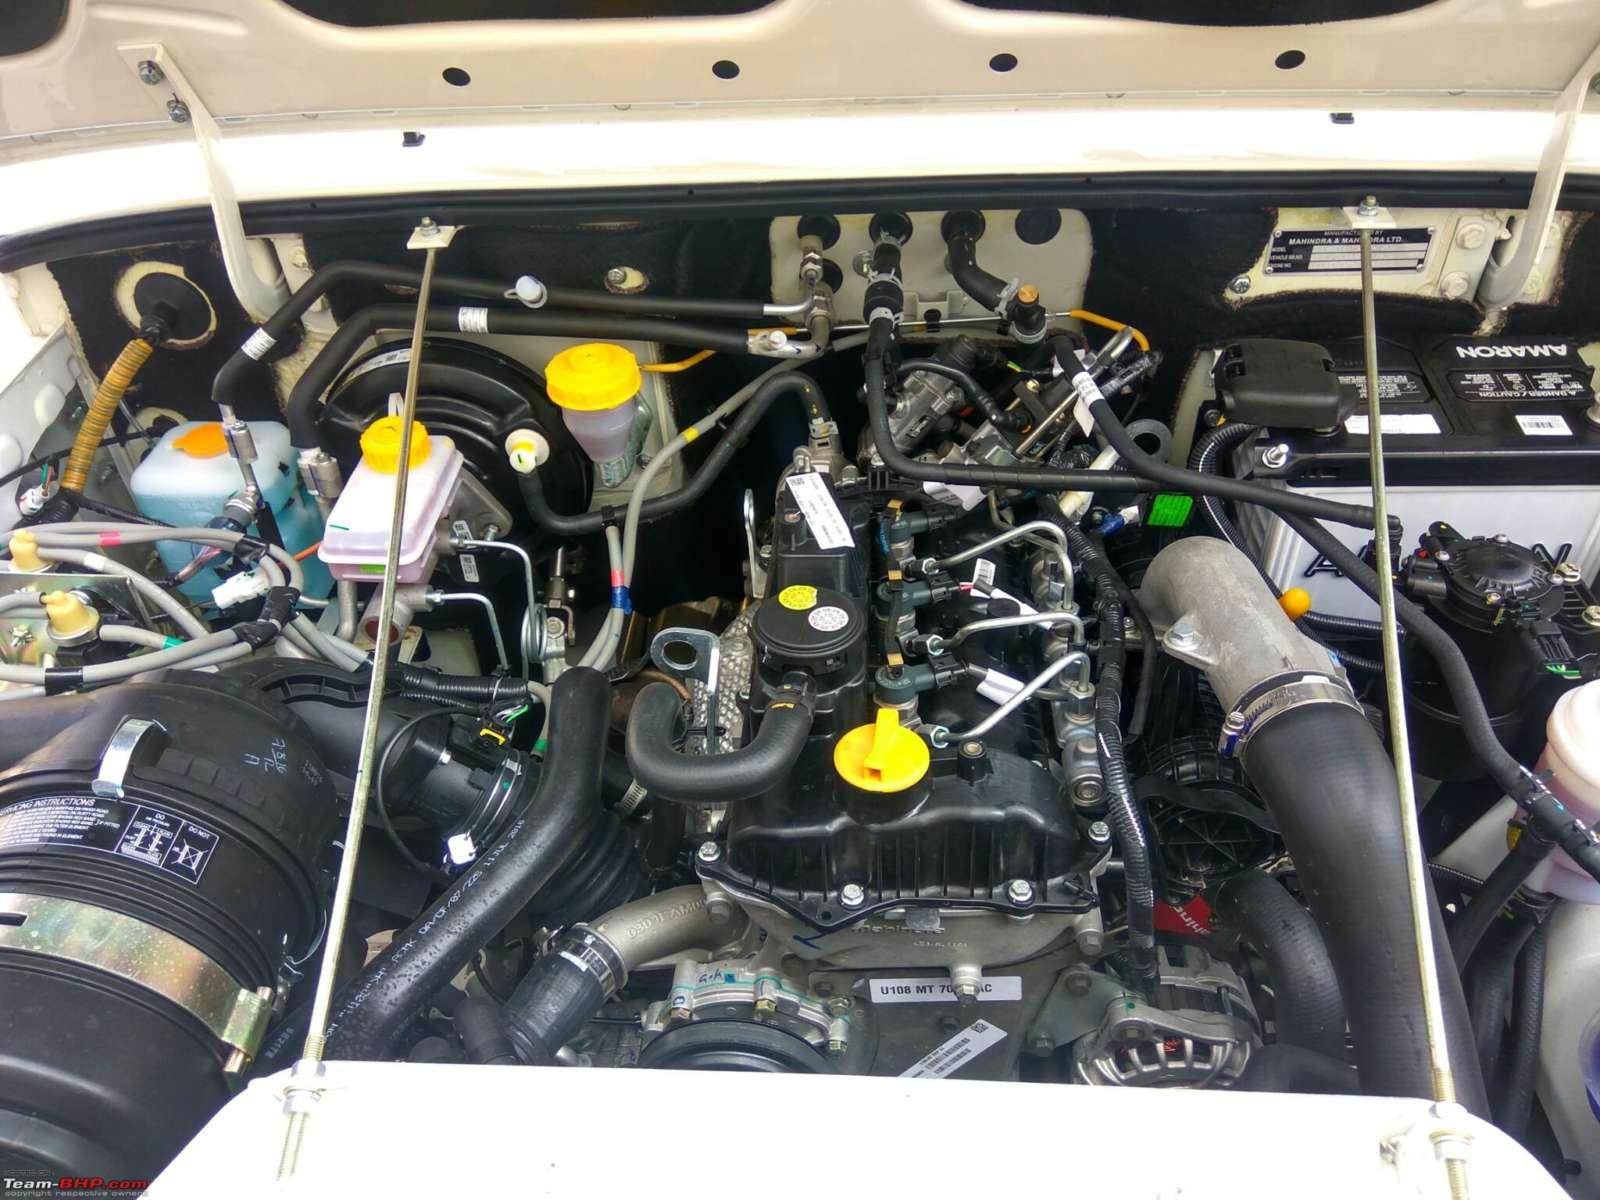 New Mahindra Bolero Power Detailed In New Images Motoroids